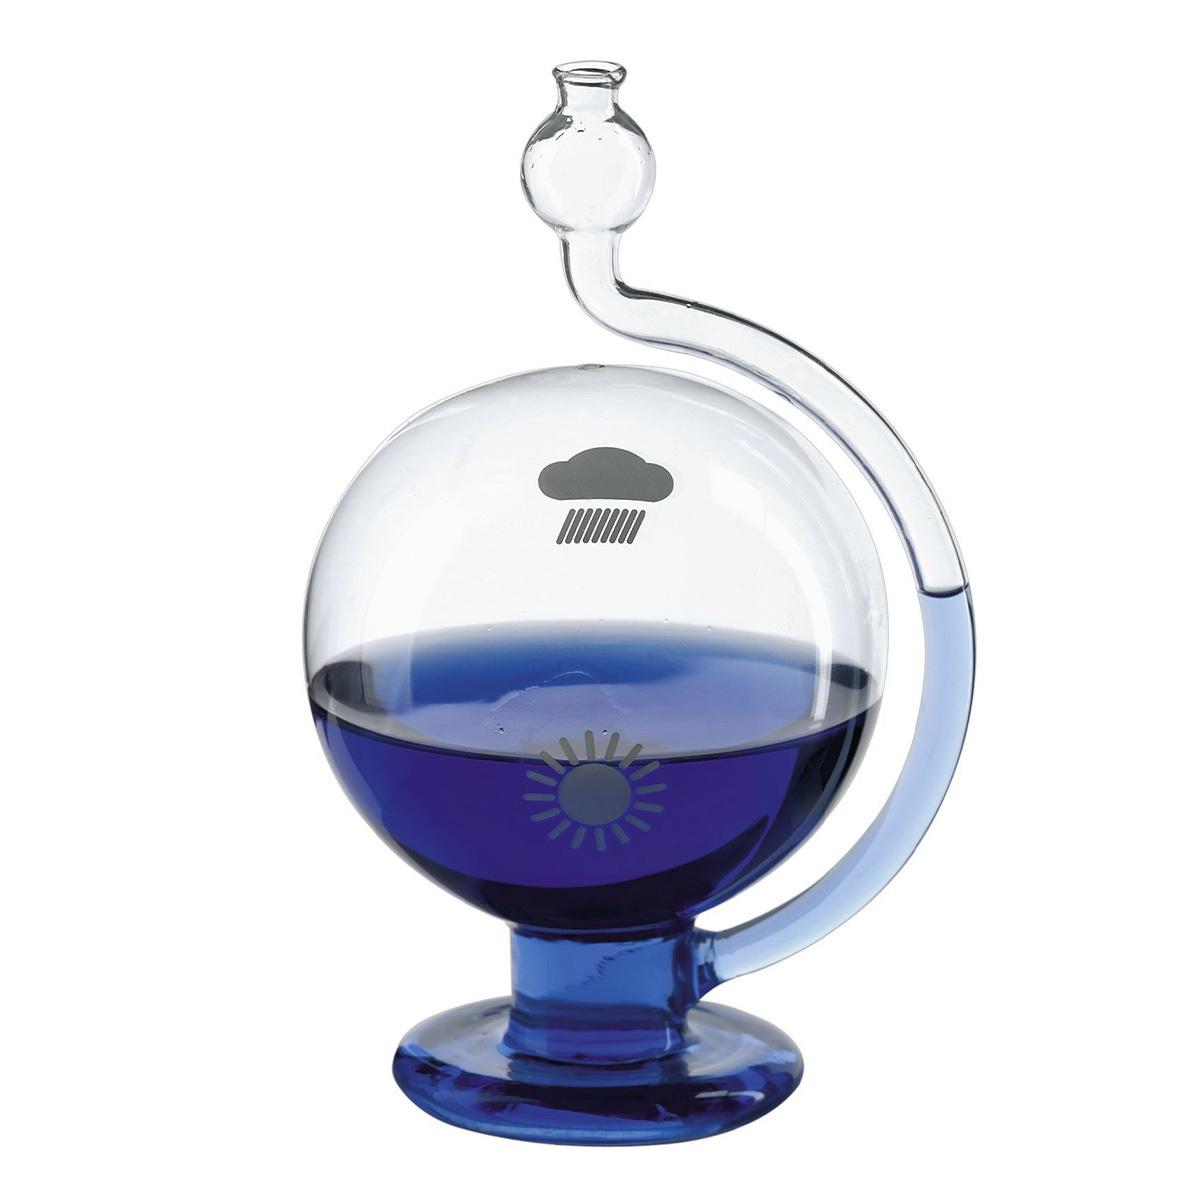 29-2000-01-wetterkugel-blau-1200x1200px.jpg